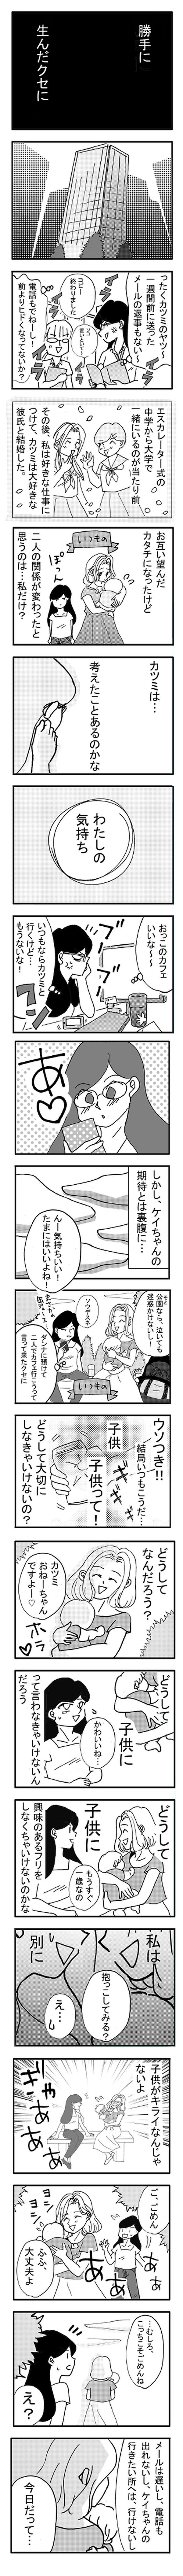 s_2.jpg